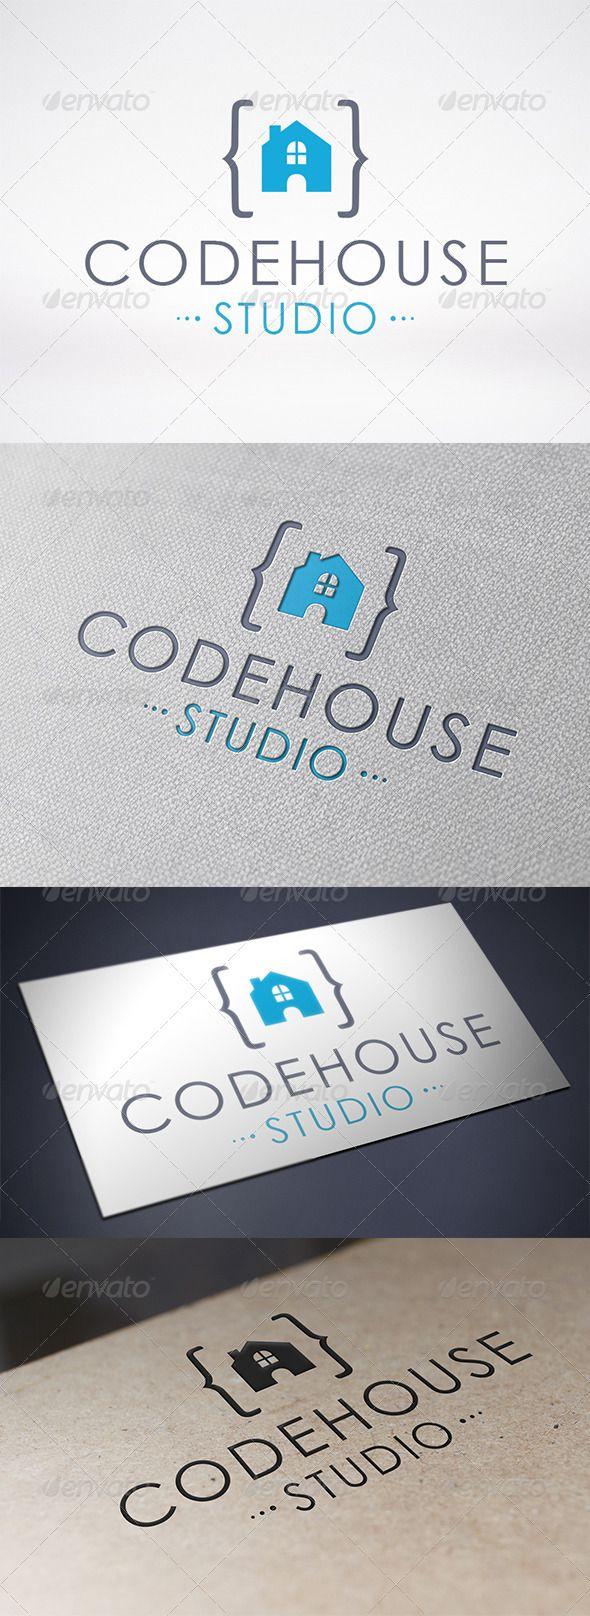 Code House Logo Template - Buildings Logo Templates